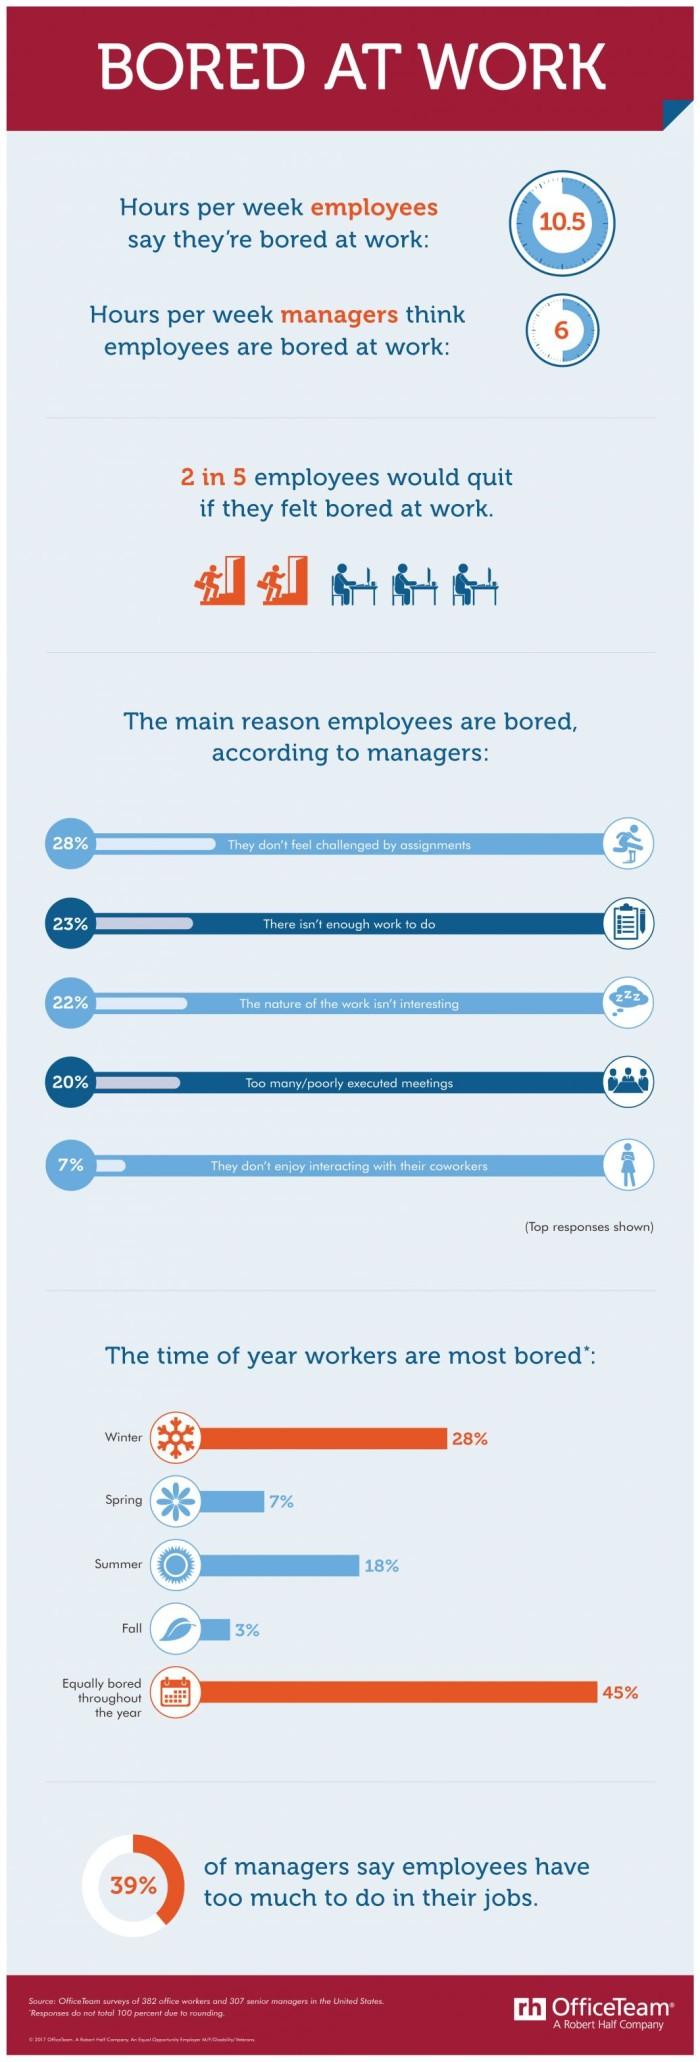 Bridgette_20_10_2017_Bored at work infographic_OT